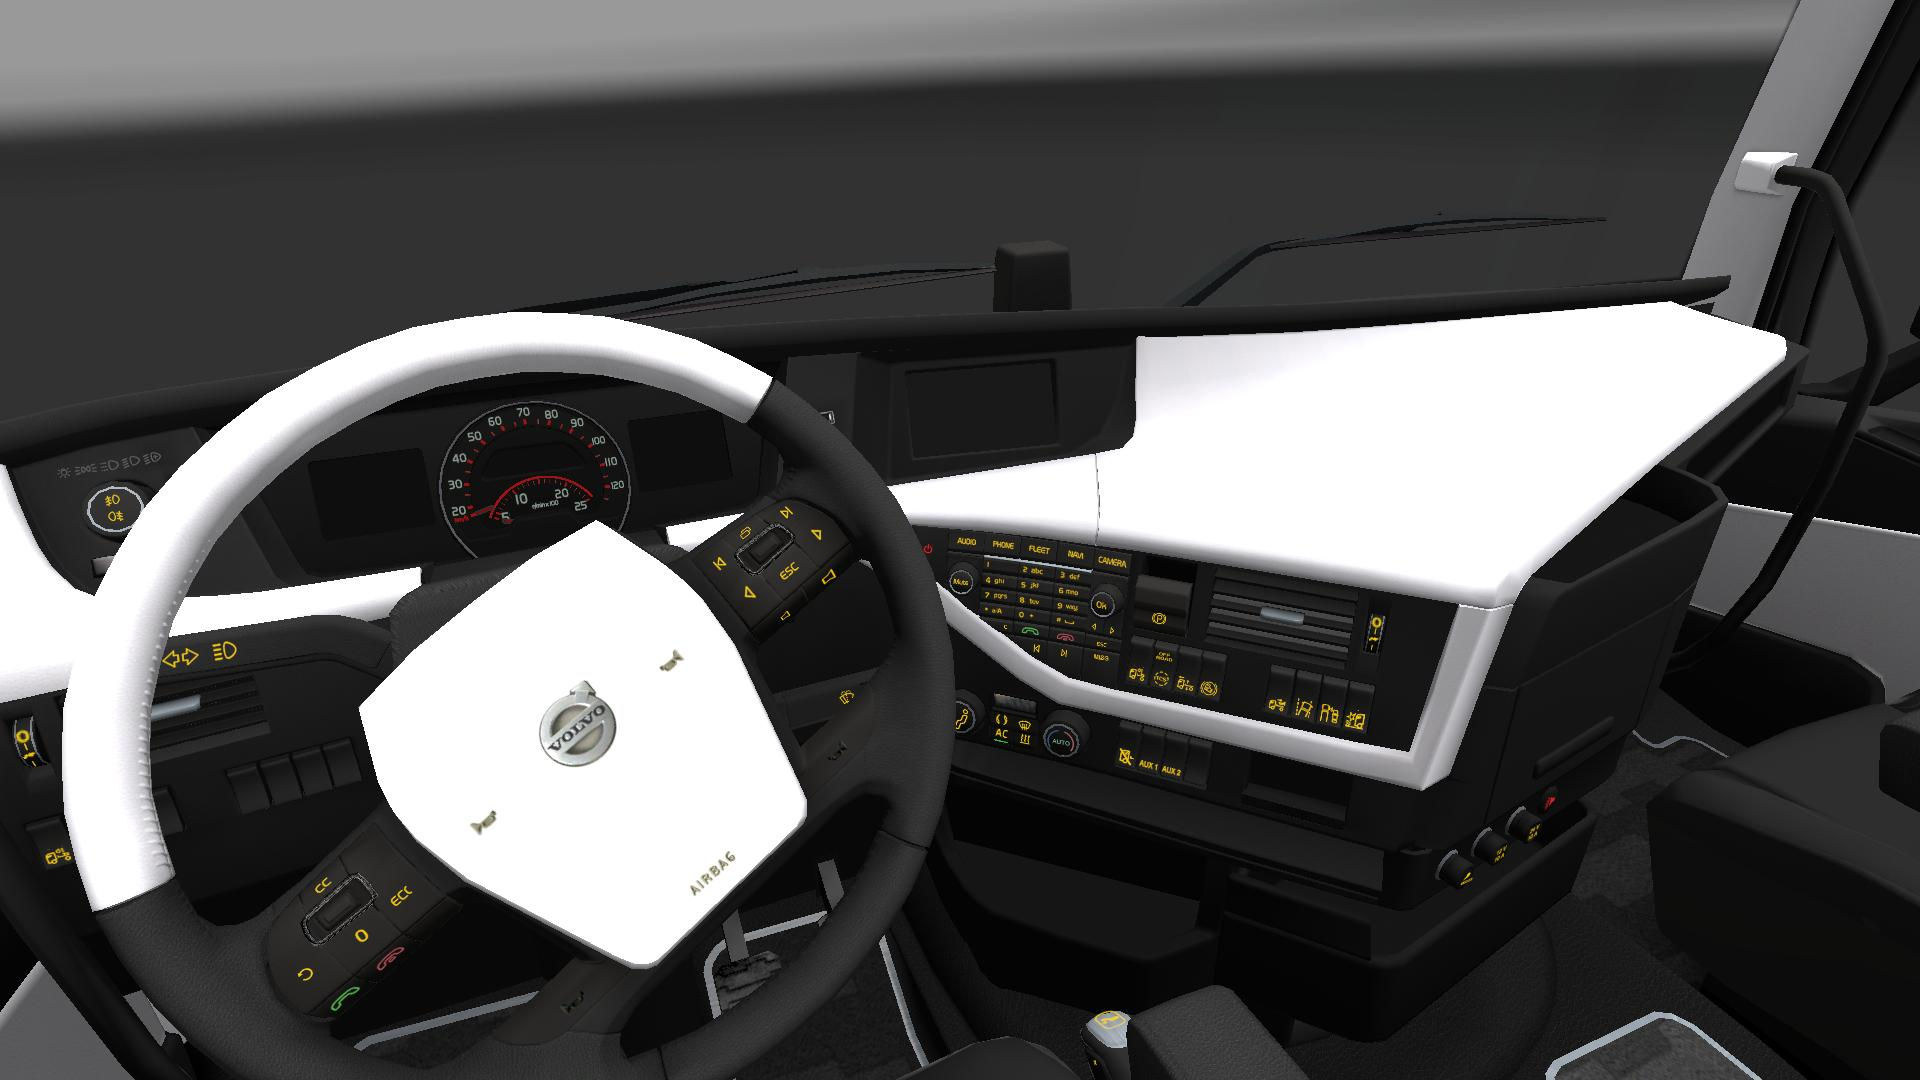 Volvo Fh16 Interior Edition v2.0 - Modhub.us